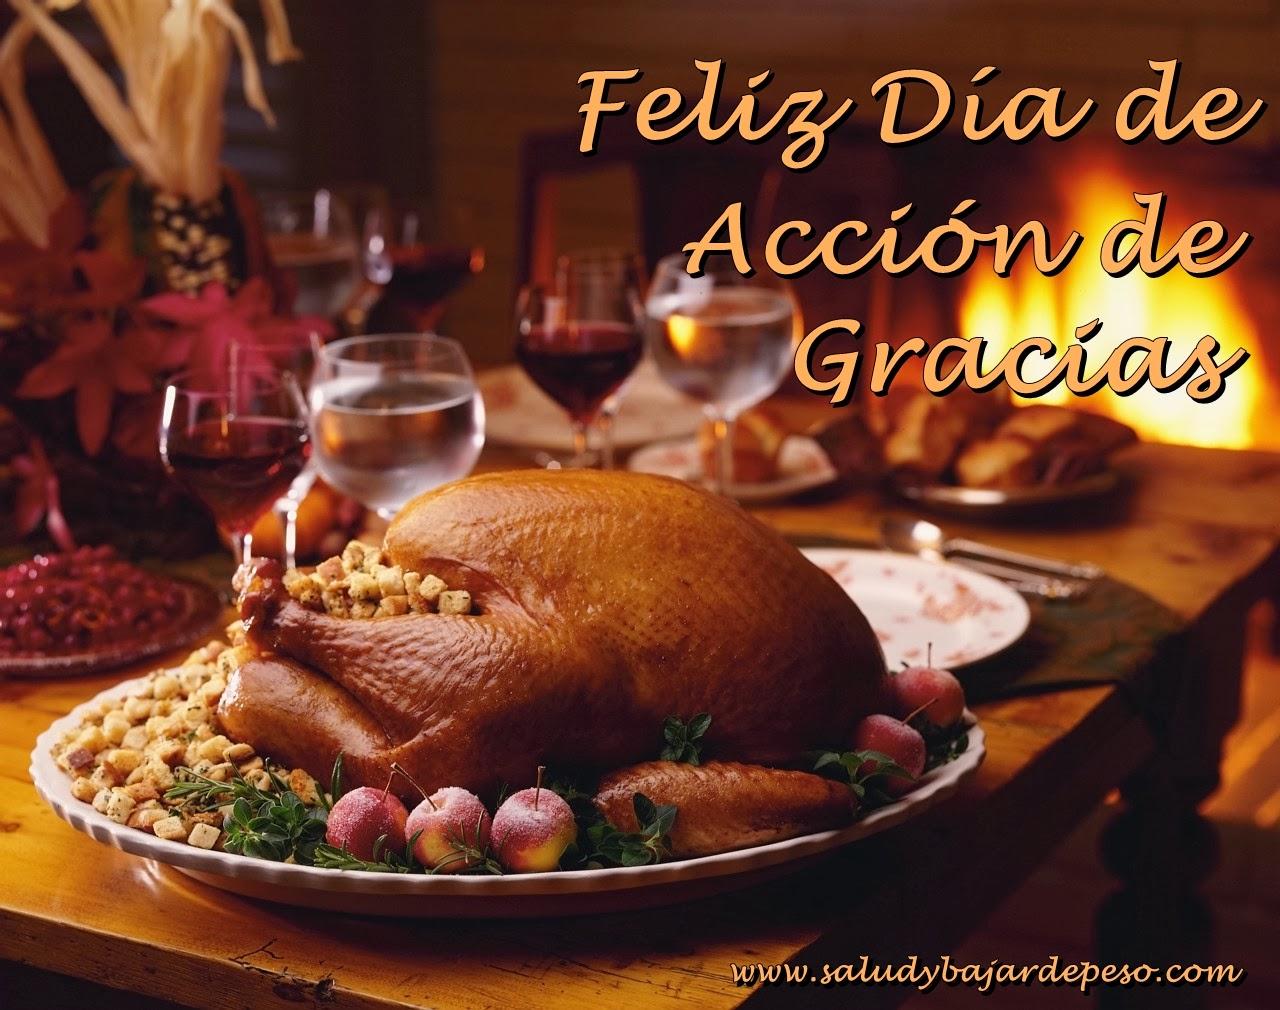 Feliz Dia De Accion De Gracias Chistosas